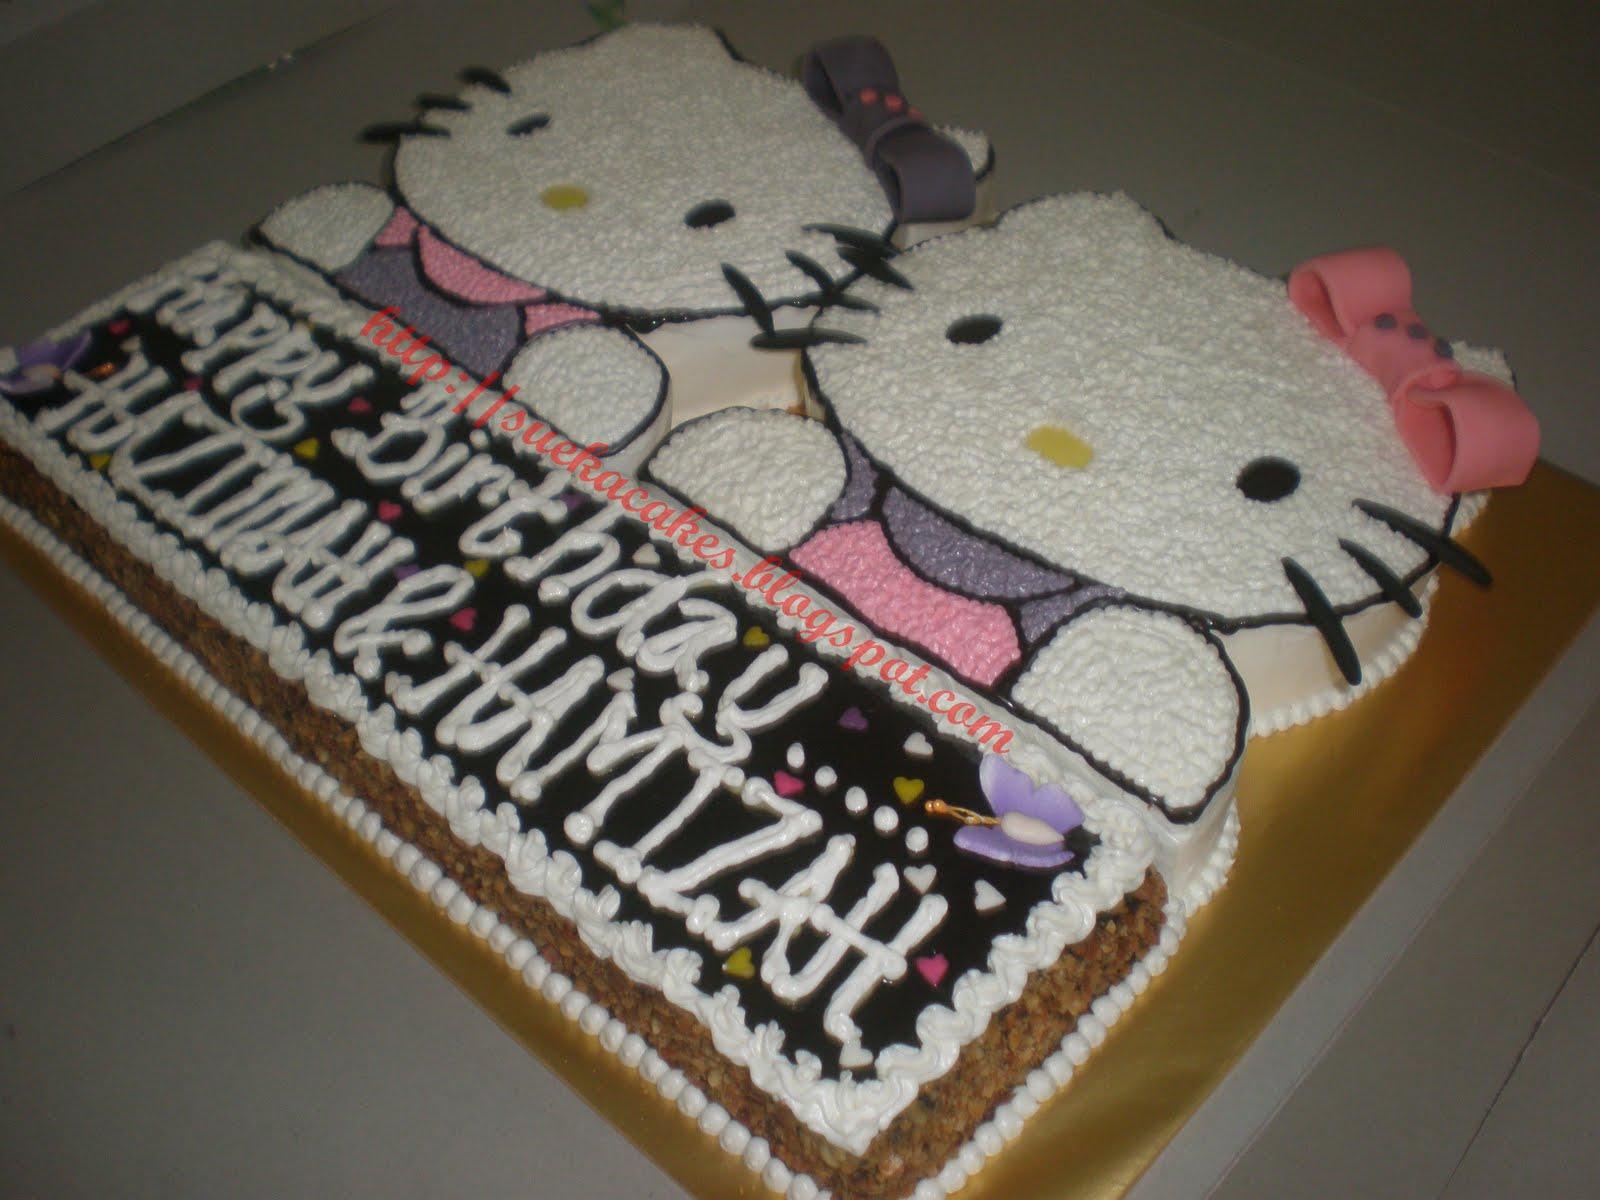 Suekacakes Amp Cafe Yg Pastinya Halal Hello Kitty Kek